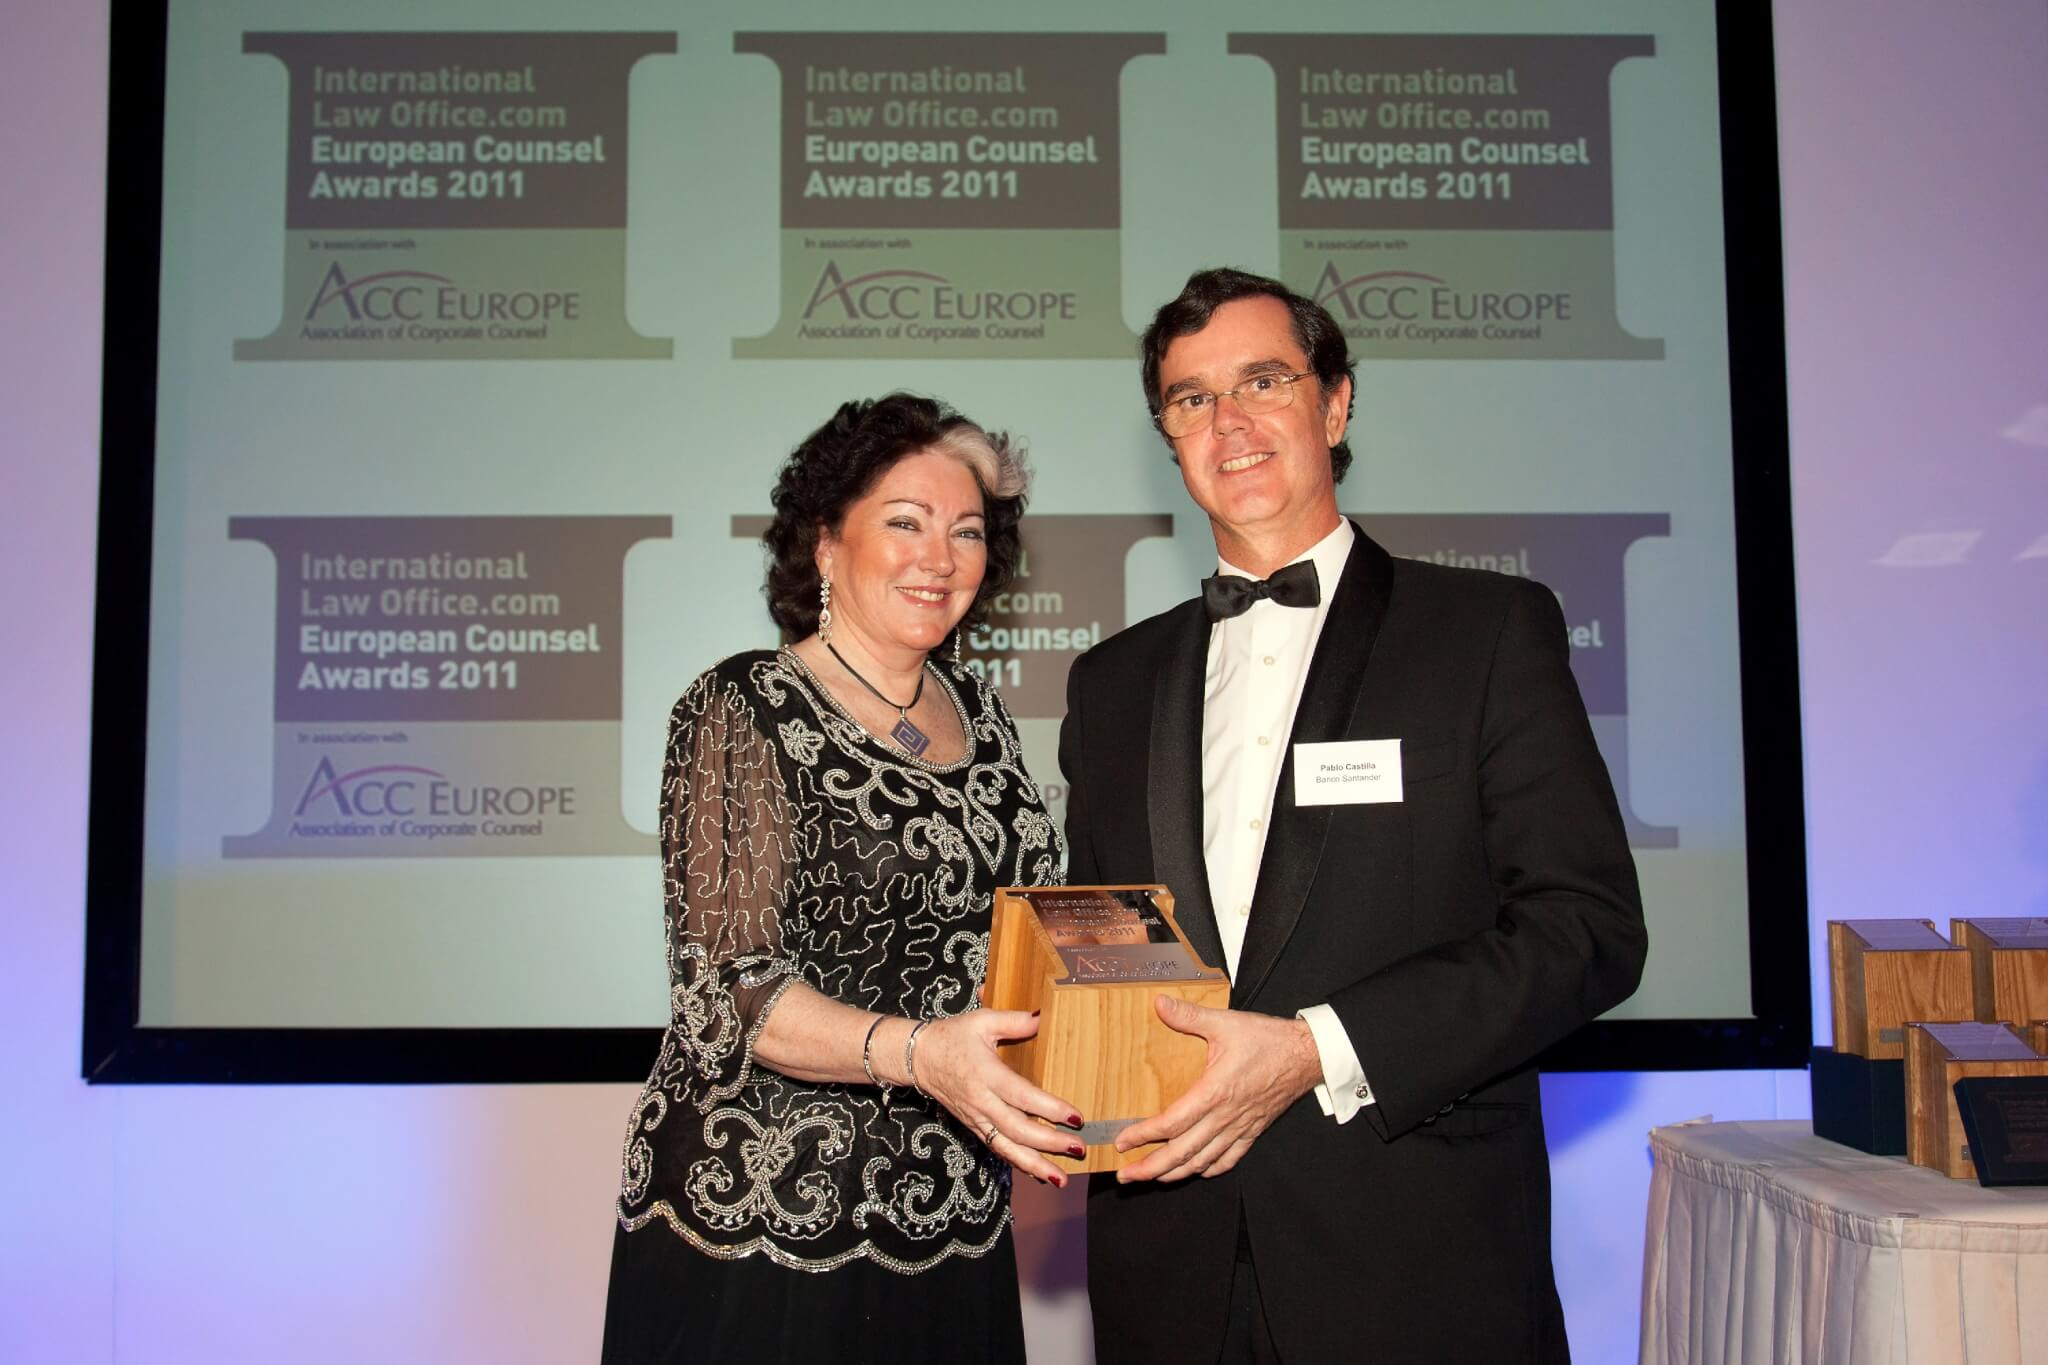 Global Counsel Awards